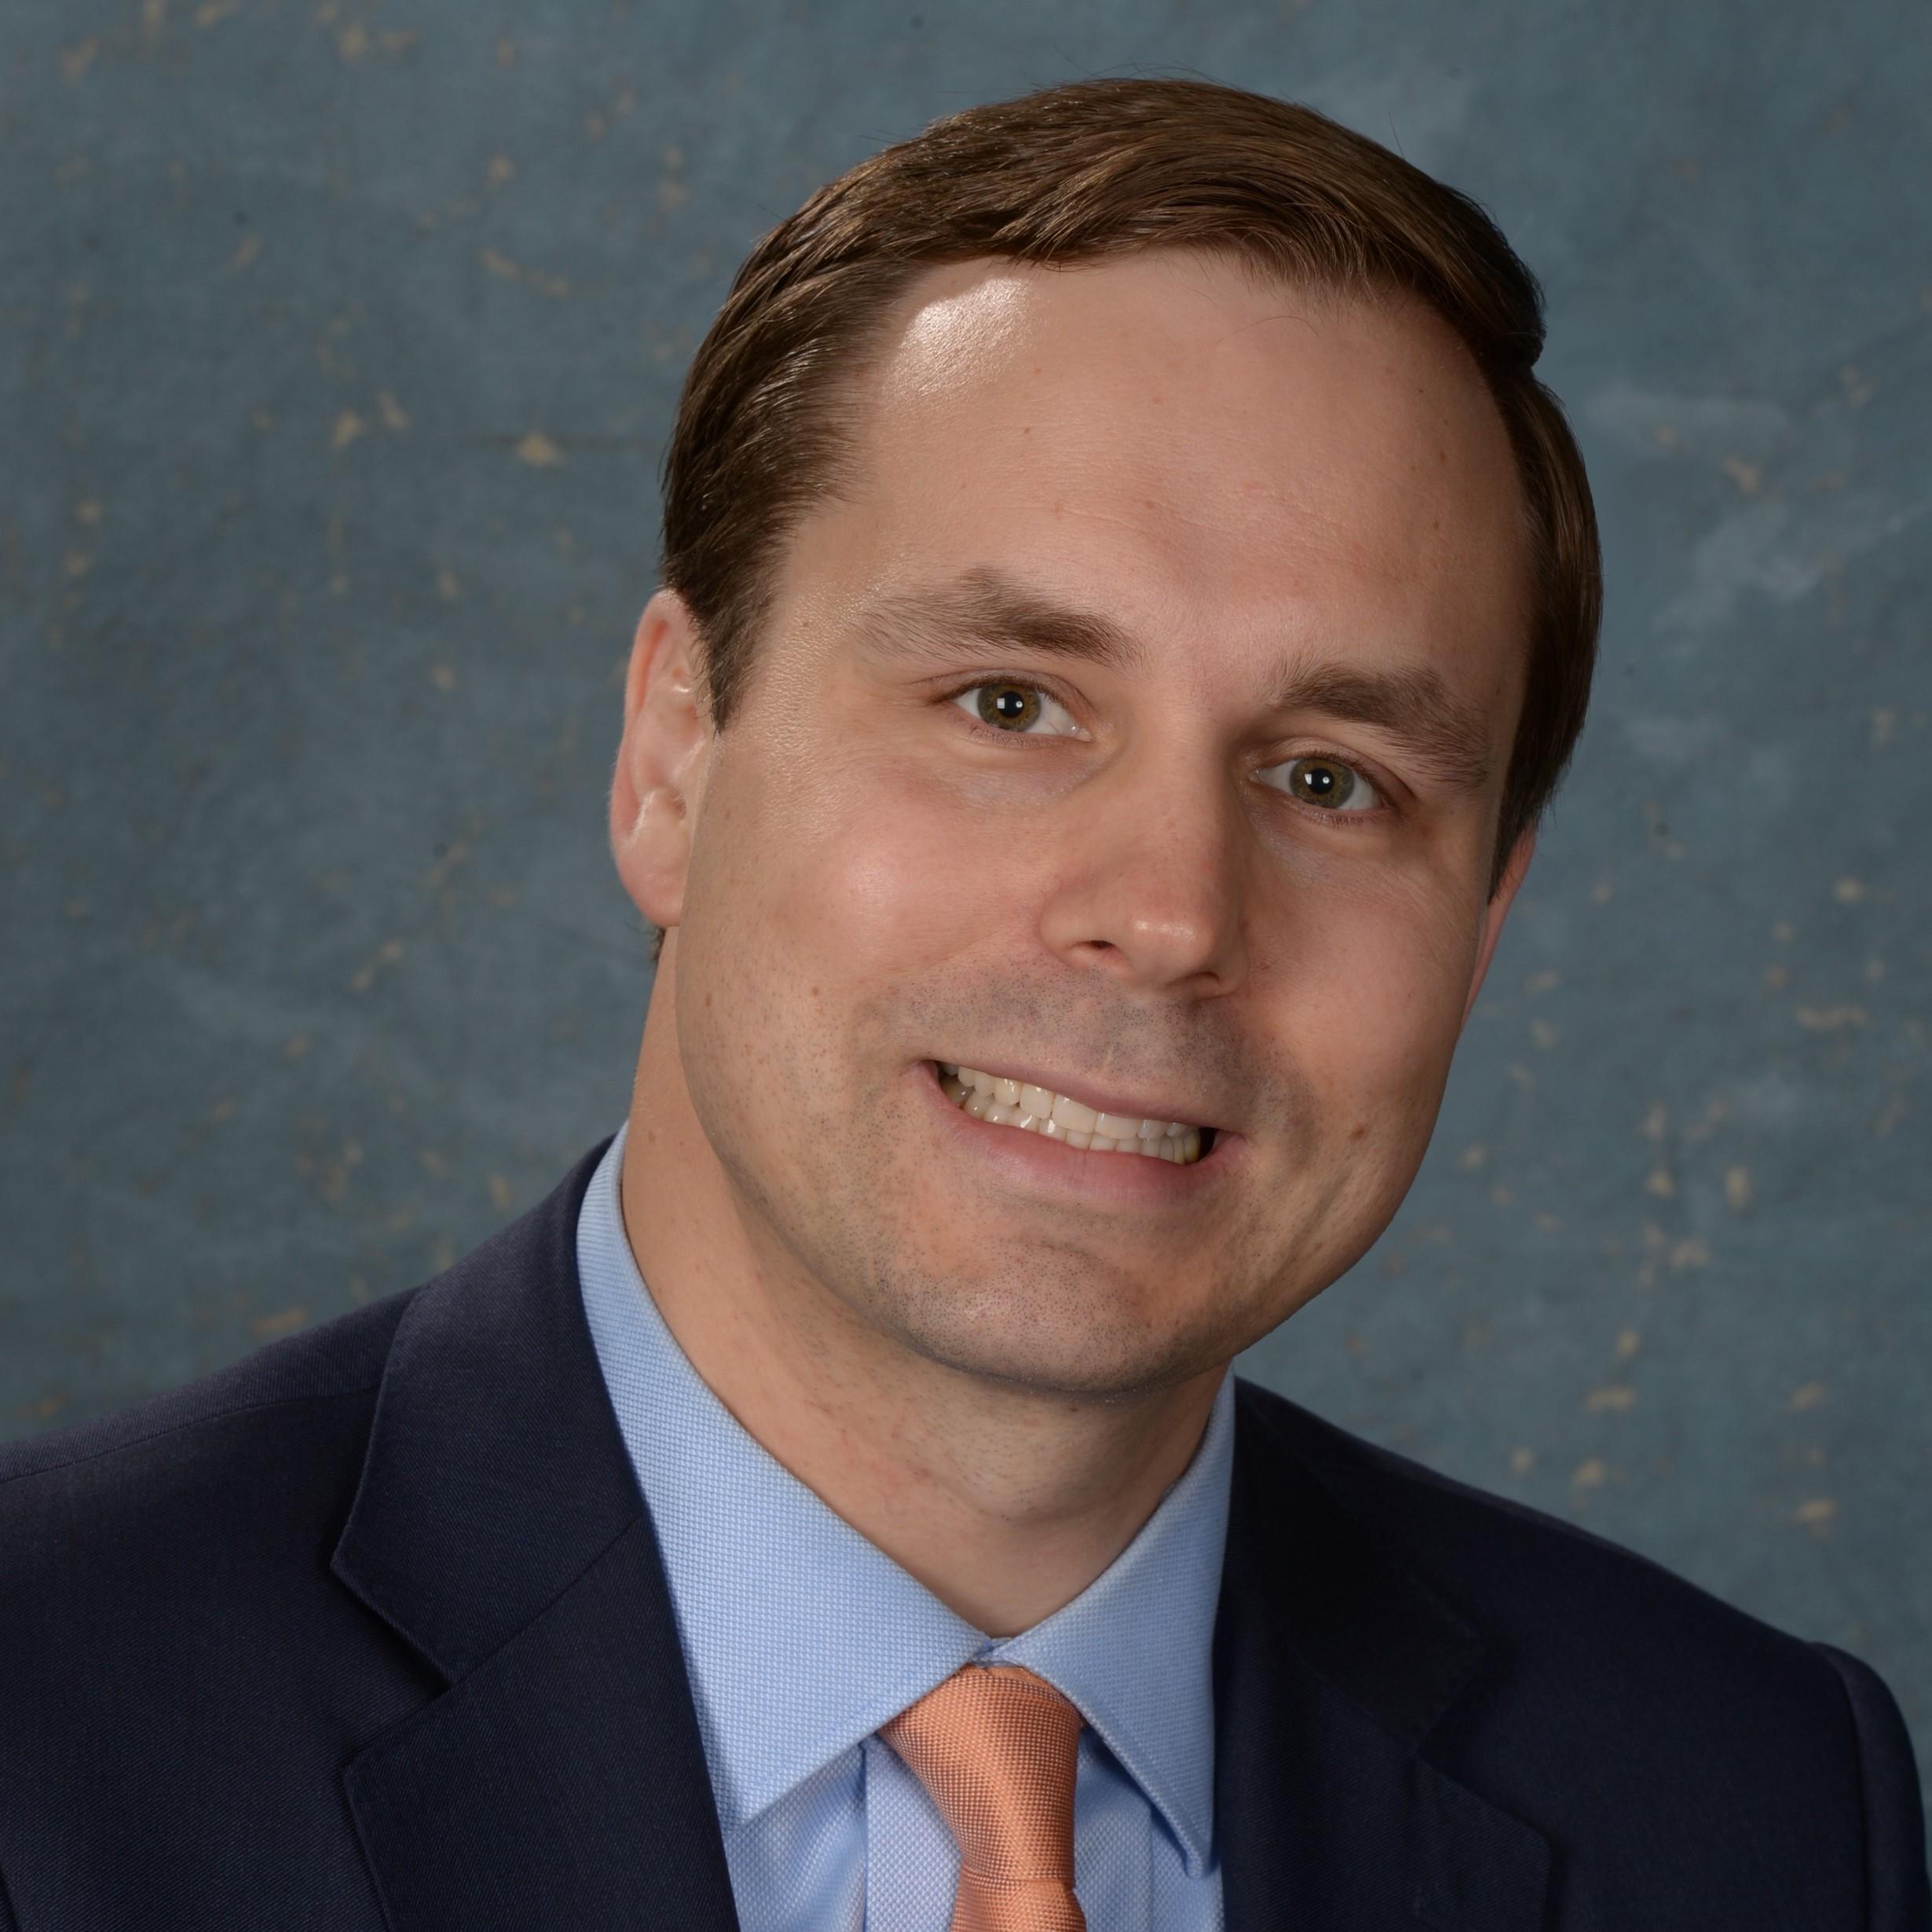 Jordan Hankwitz